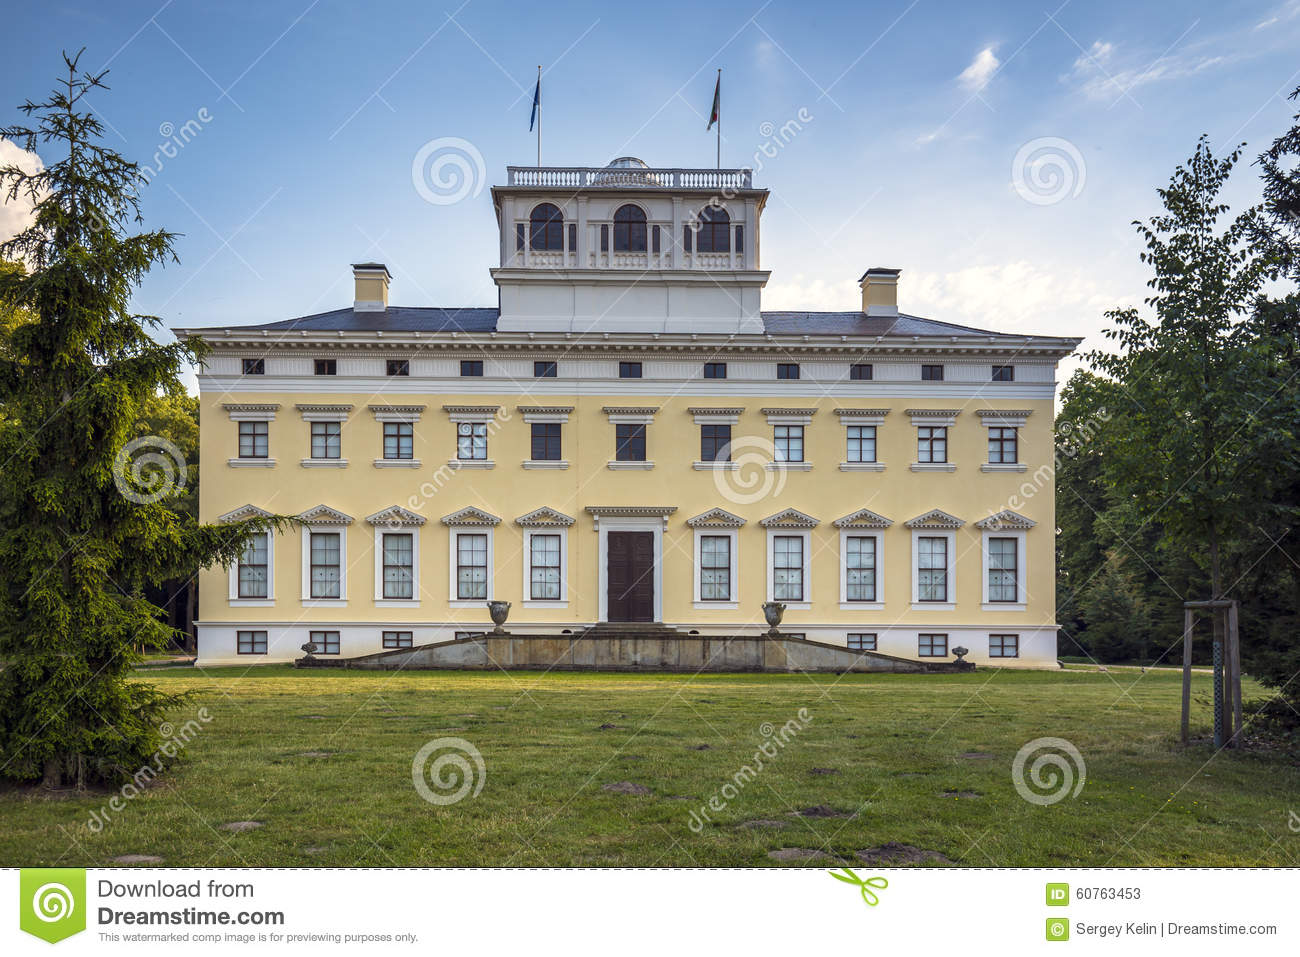 Wörlitz Castle In Dessau.